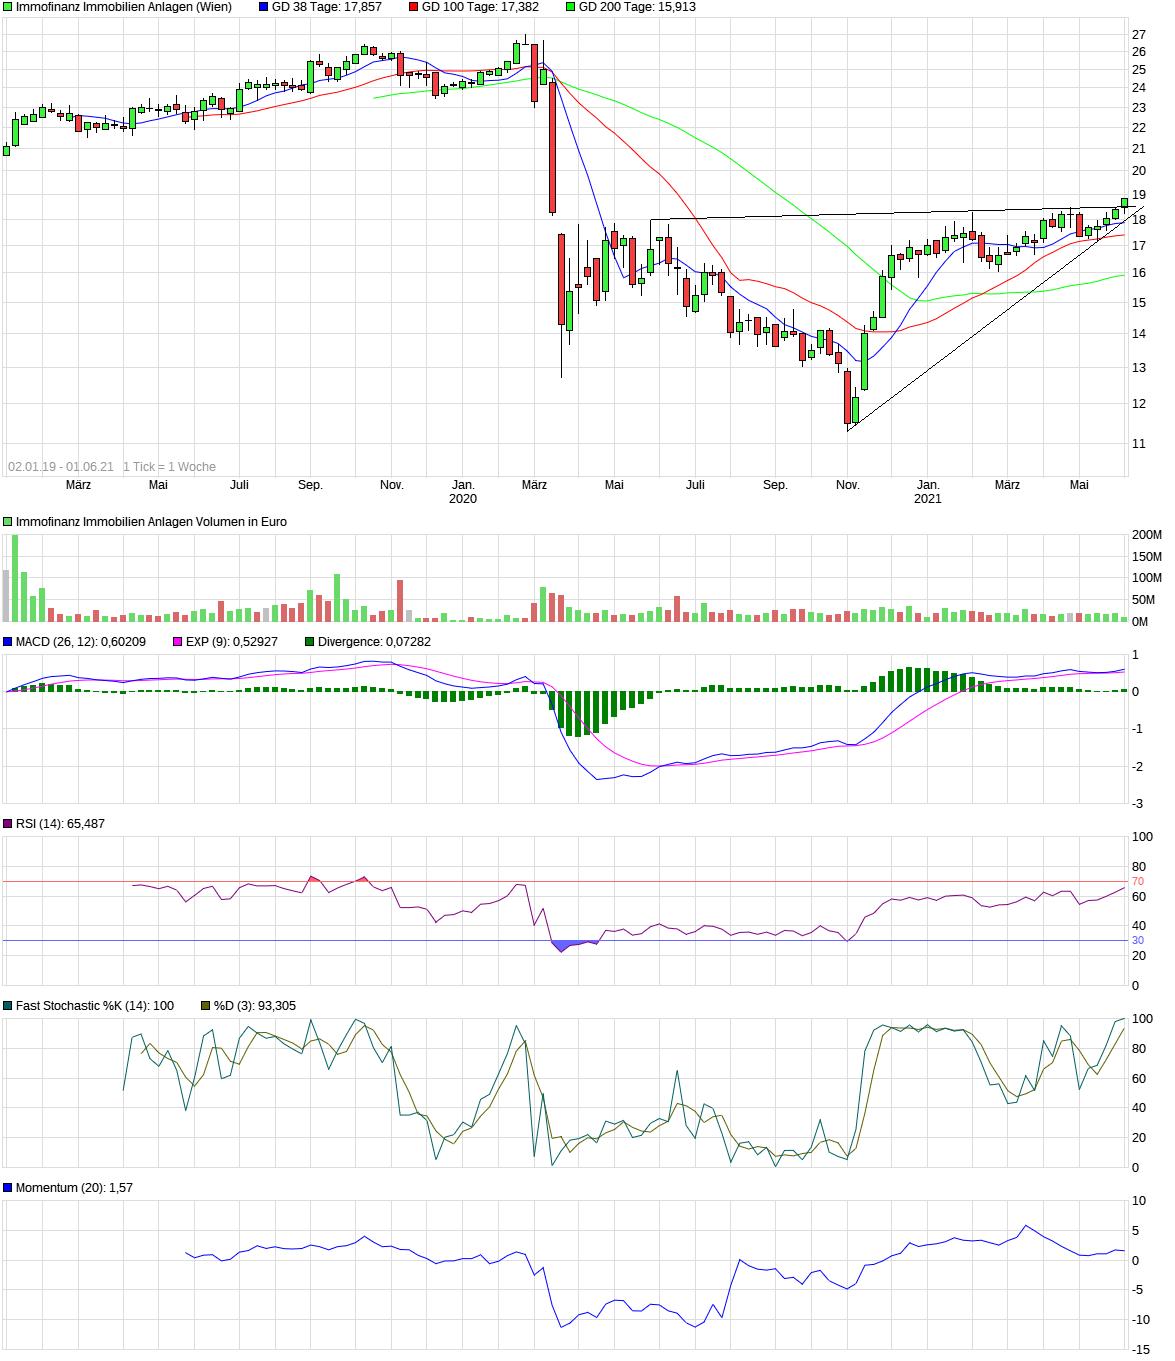 chart_3years_immofinanzimmobilienanlagen.png